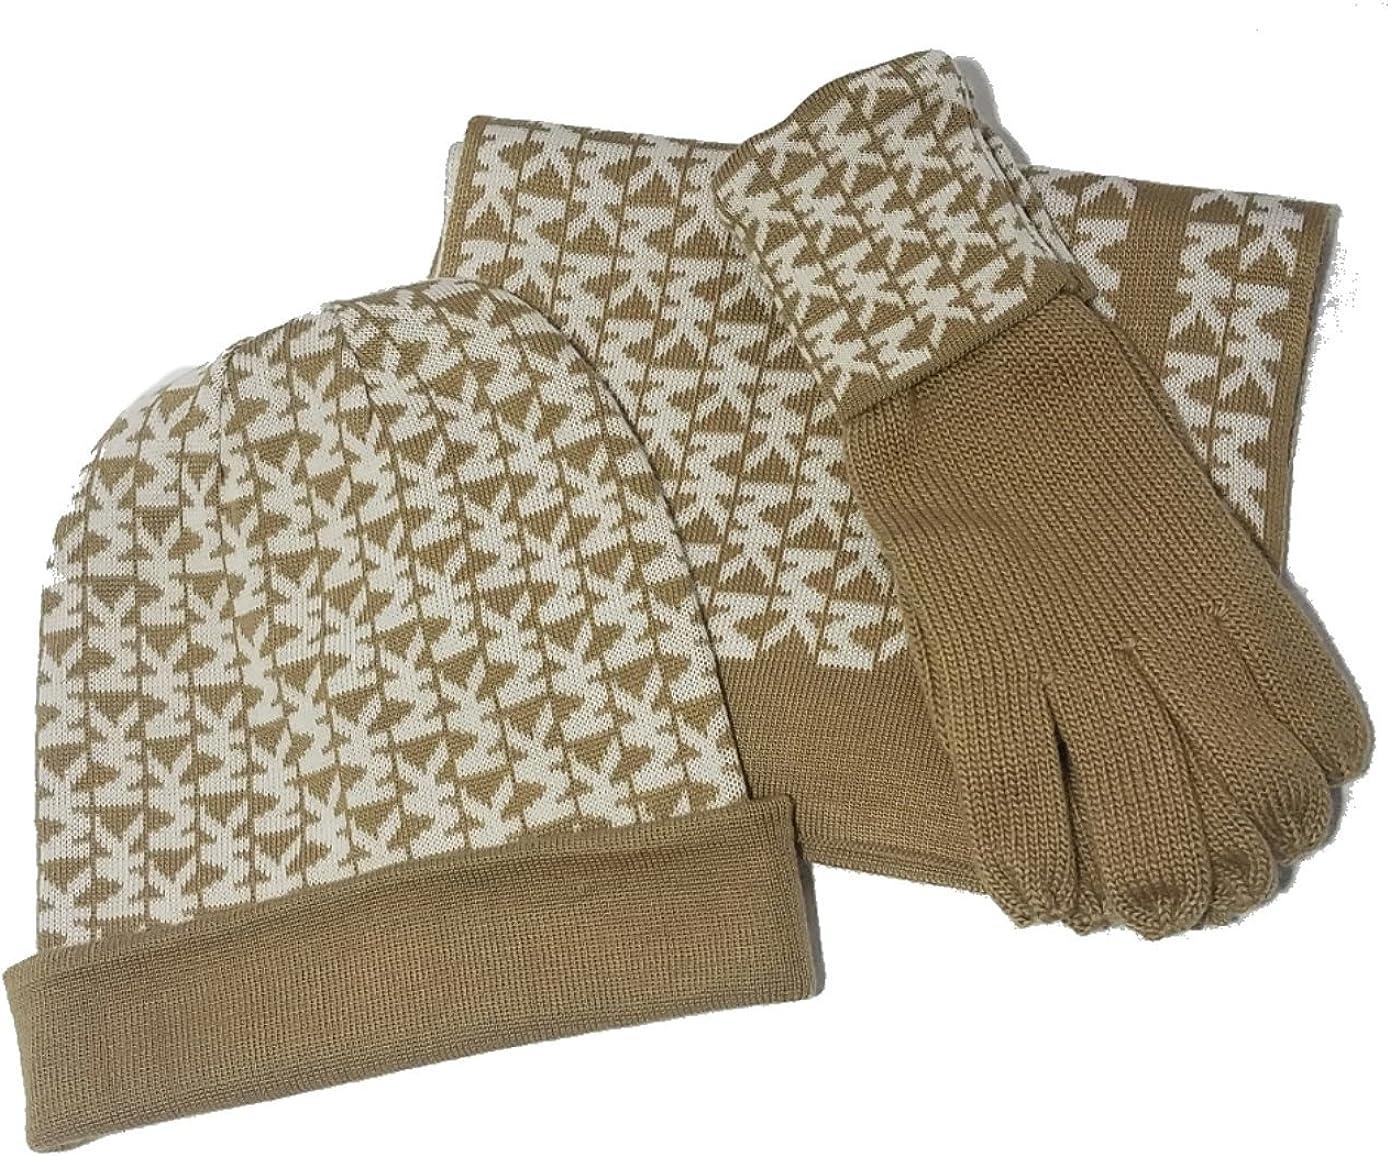 Michael Kors Women's 3 Piece Set MK Logo Scarf, Hat & Gloves, Camel/Cream